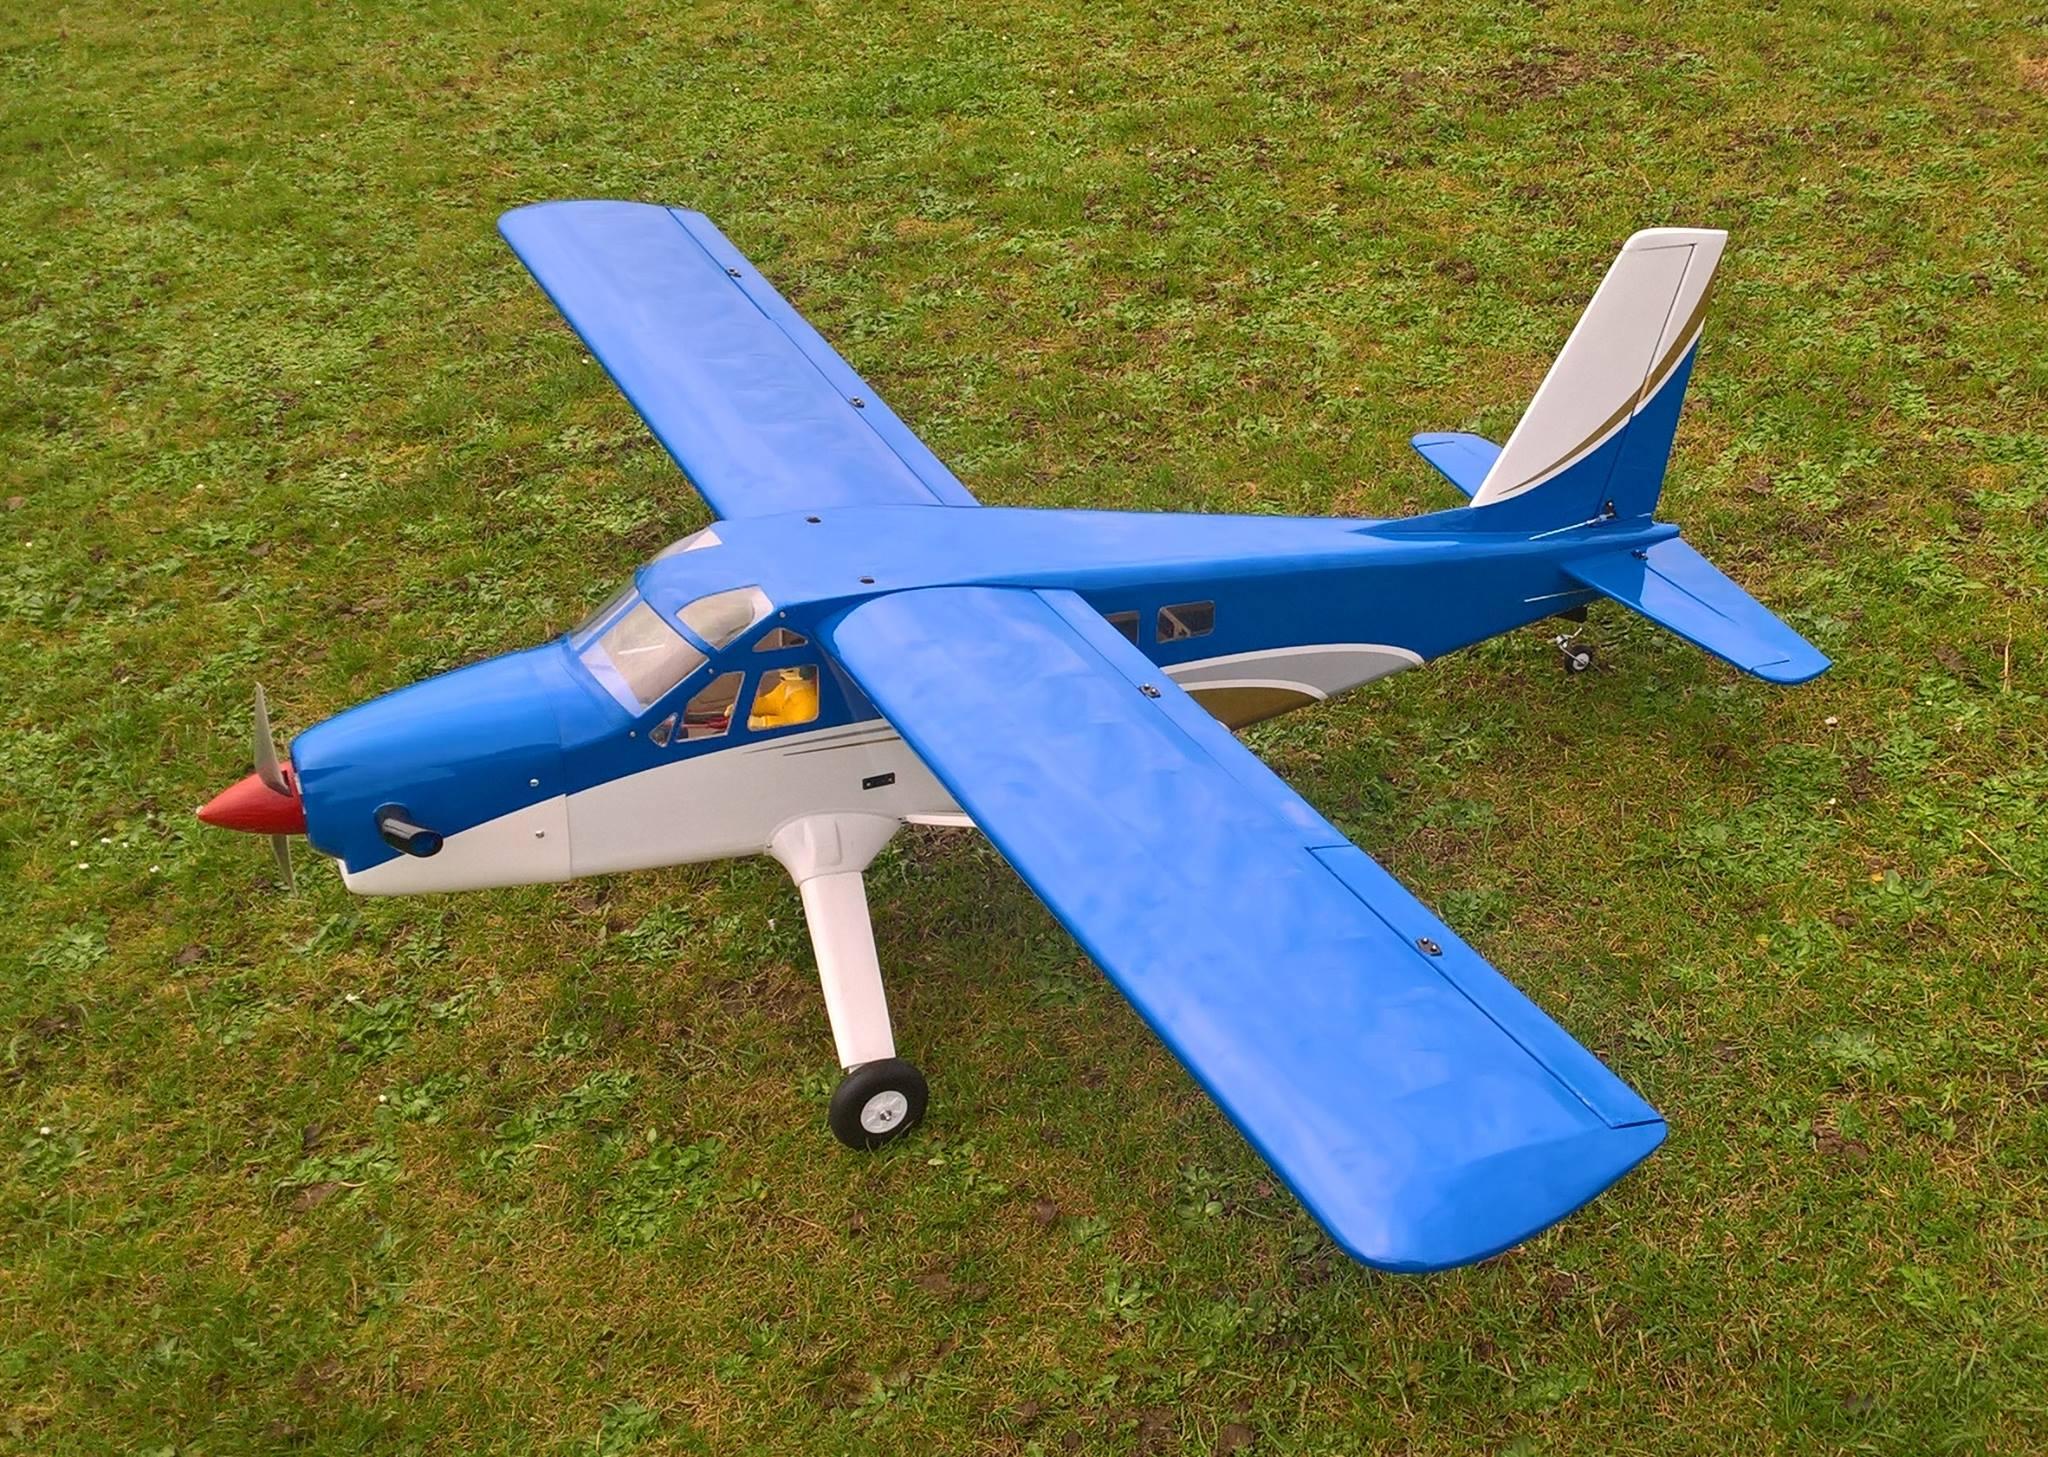 richard_blue_plane2